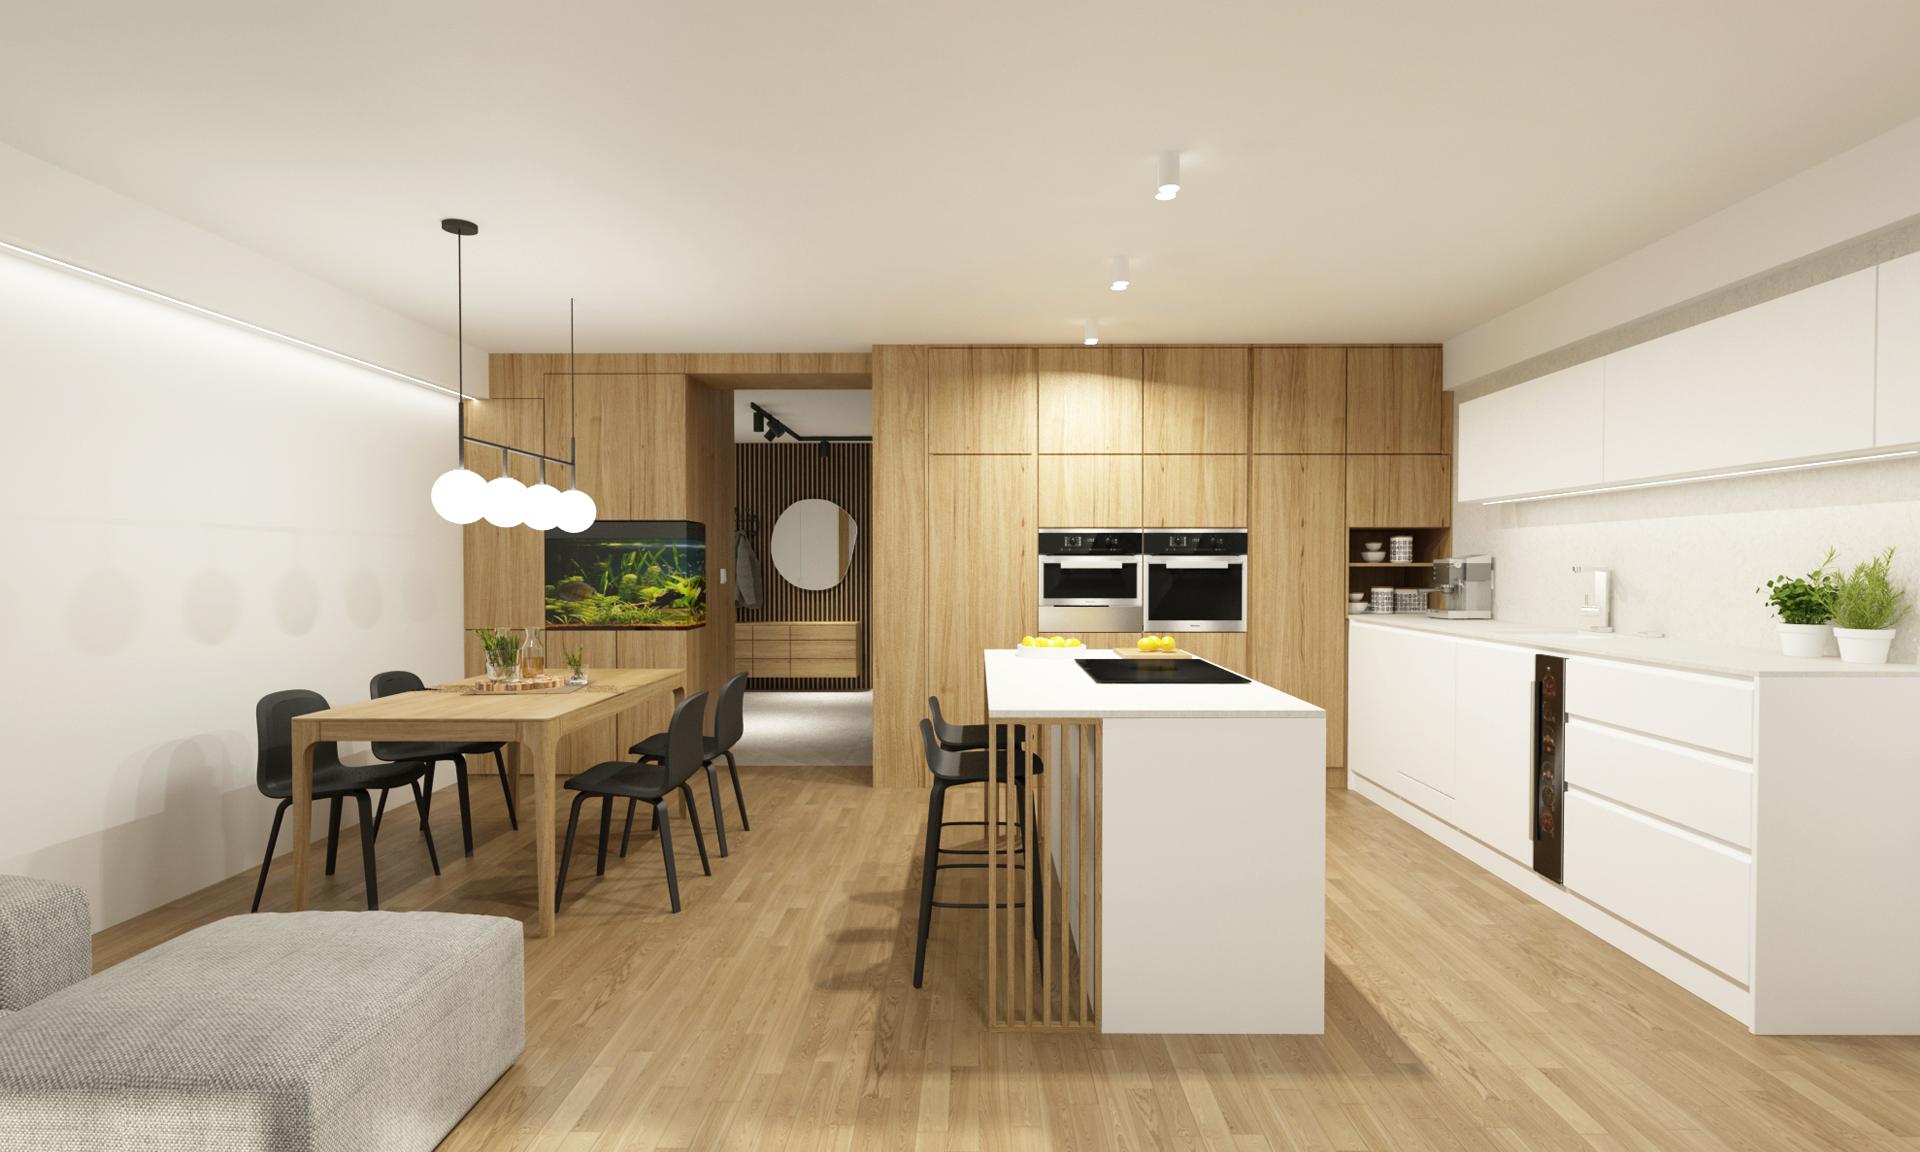 navrh interieru bytu, navrh interiru bratislava, rekonstrukcia bytu, rekonstrukcia bytu bratislava, navrh interieru kuchyne, vizualizacie kuchyne, vizualizacie, navrh kuchyne, dizajn jedalne, interierovy dizajner, muuto chair, muuto barstool, interierovy dizajn, oak interior, natural interior, navrh kuchyne s jedalnou, navrh baru, navrh interieru bytu, navrh interieru bratislava